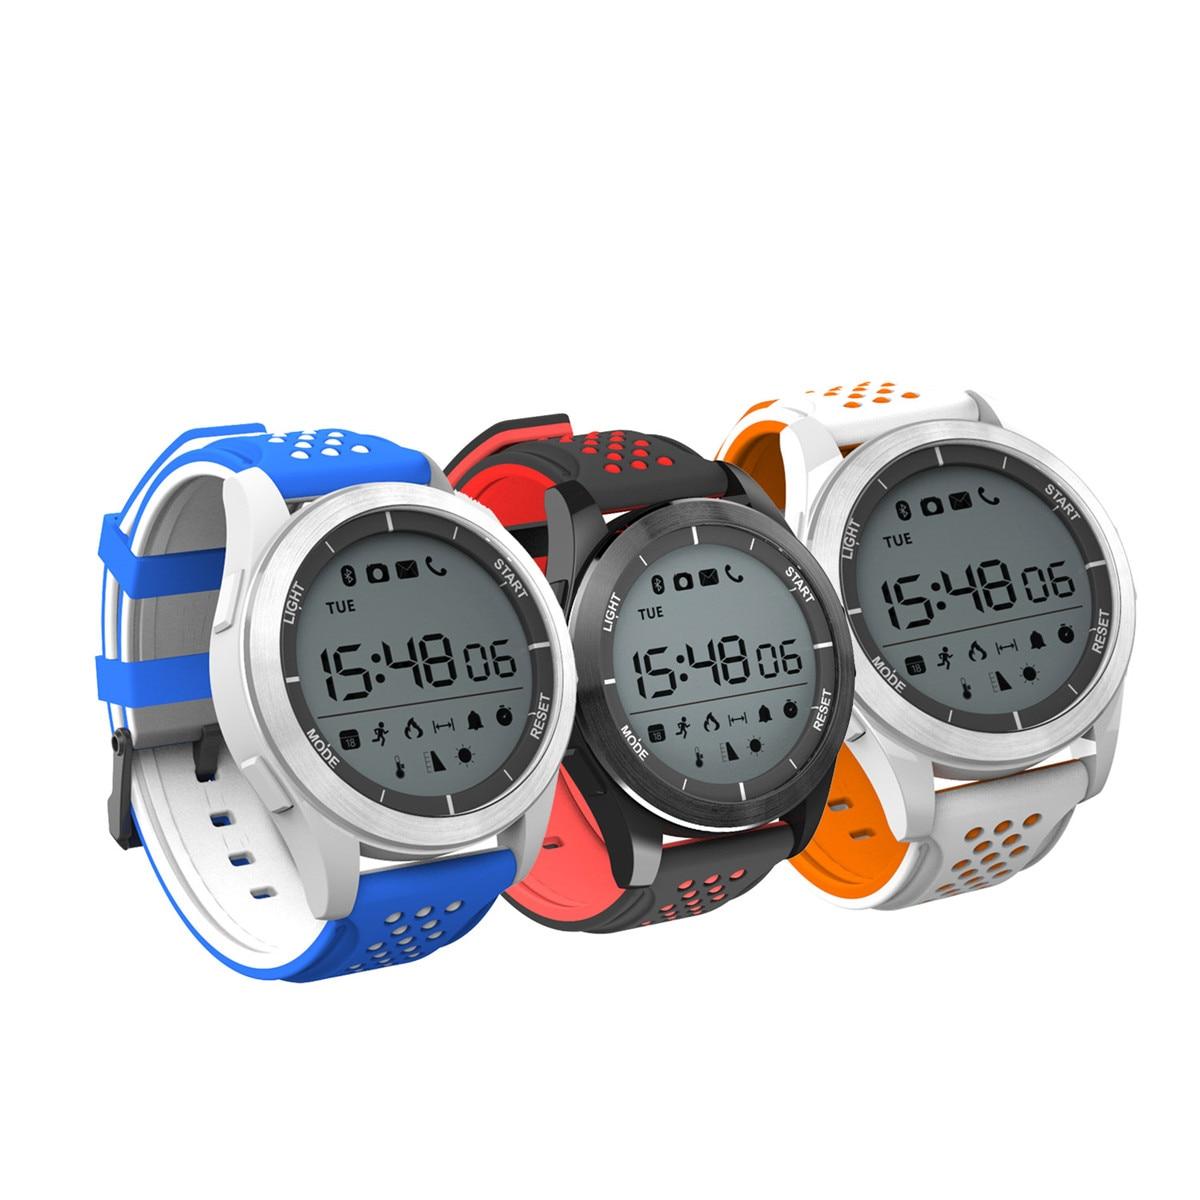 N. ° 1 F3 Smart watch deportes Bluetooth IP68 profesional impermeable natación reloj podómetro exterior reloj de pulsera para Android IOS